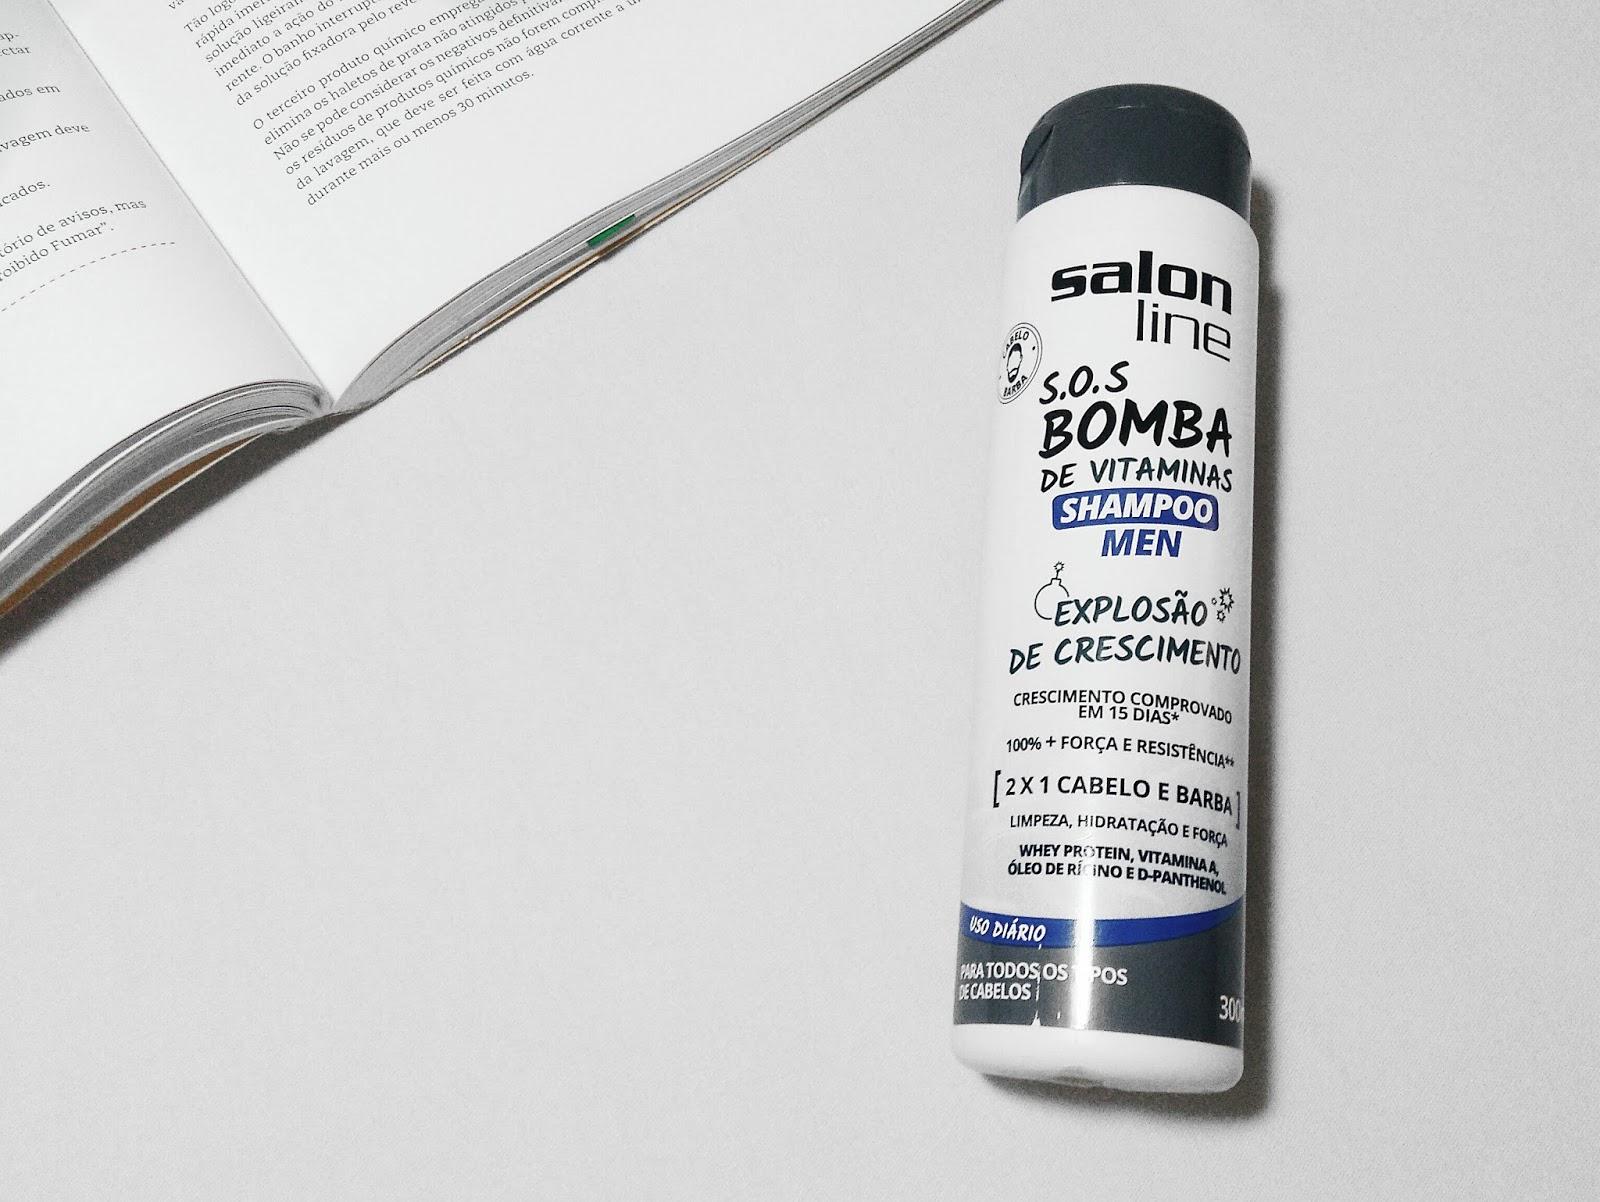 Shampoom Bomba Masculino da Salon line para crescer cabelo e barba